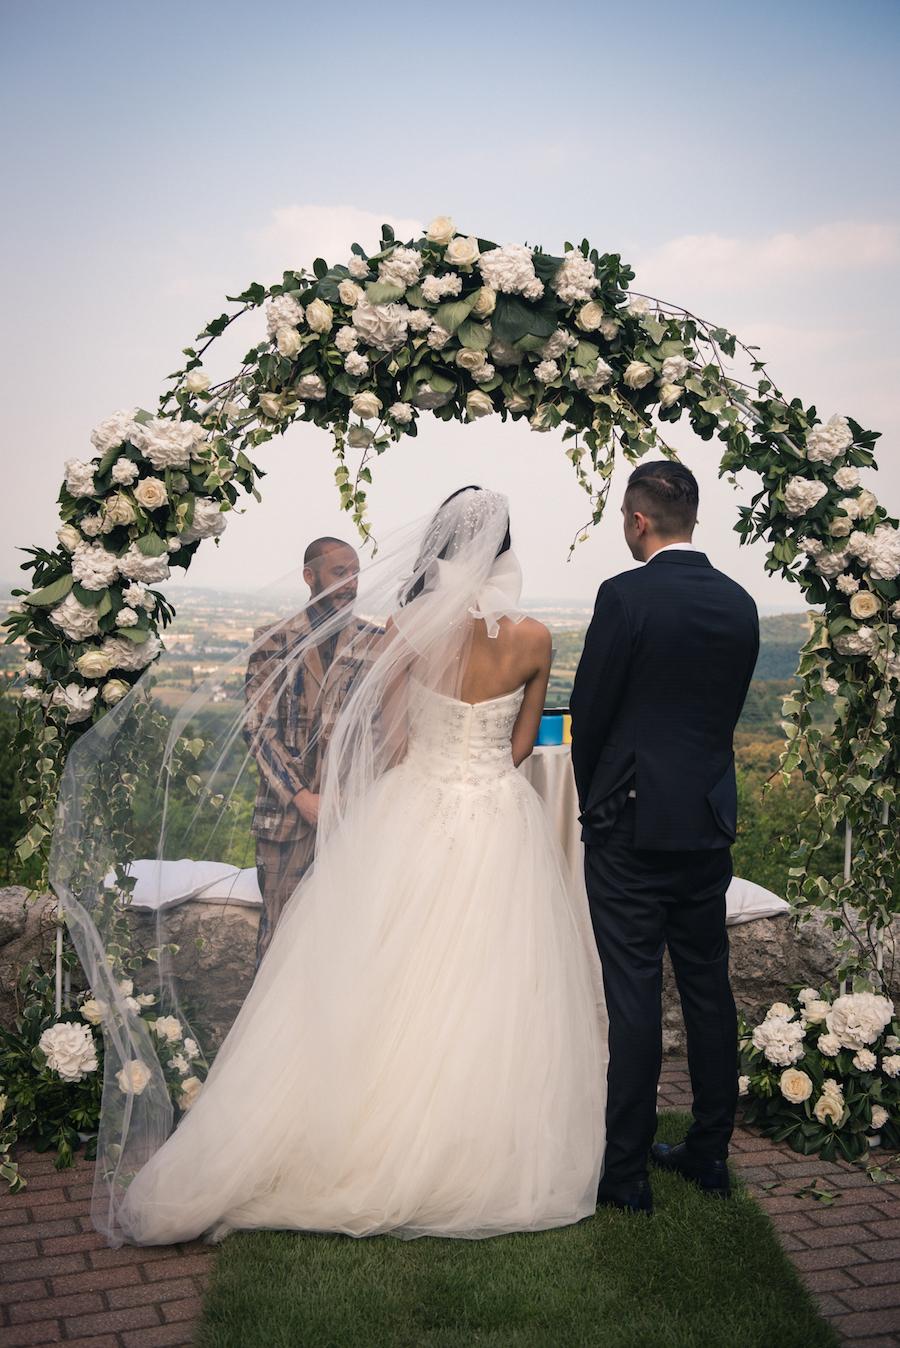 Rito Simbolico Matrimonio : Un rito simbolico per matrimonio bilingue wedding